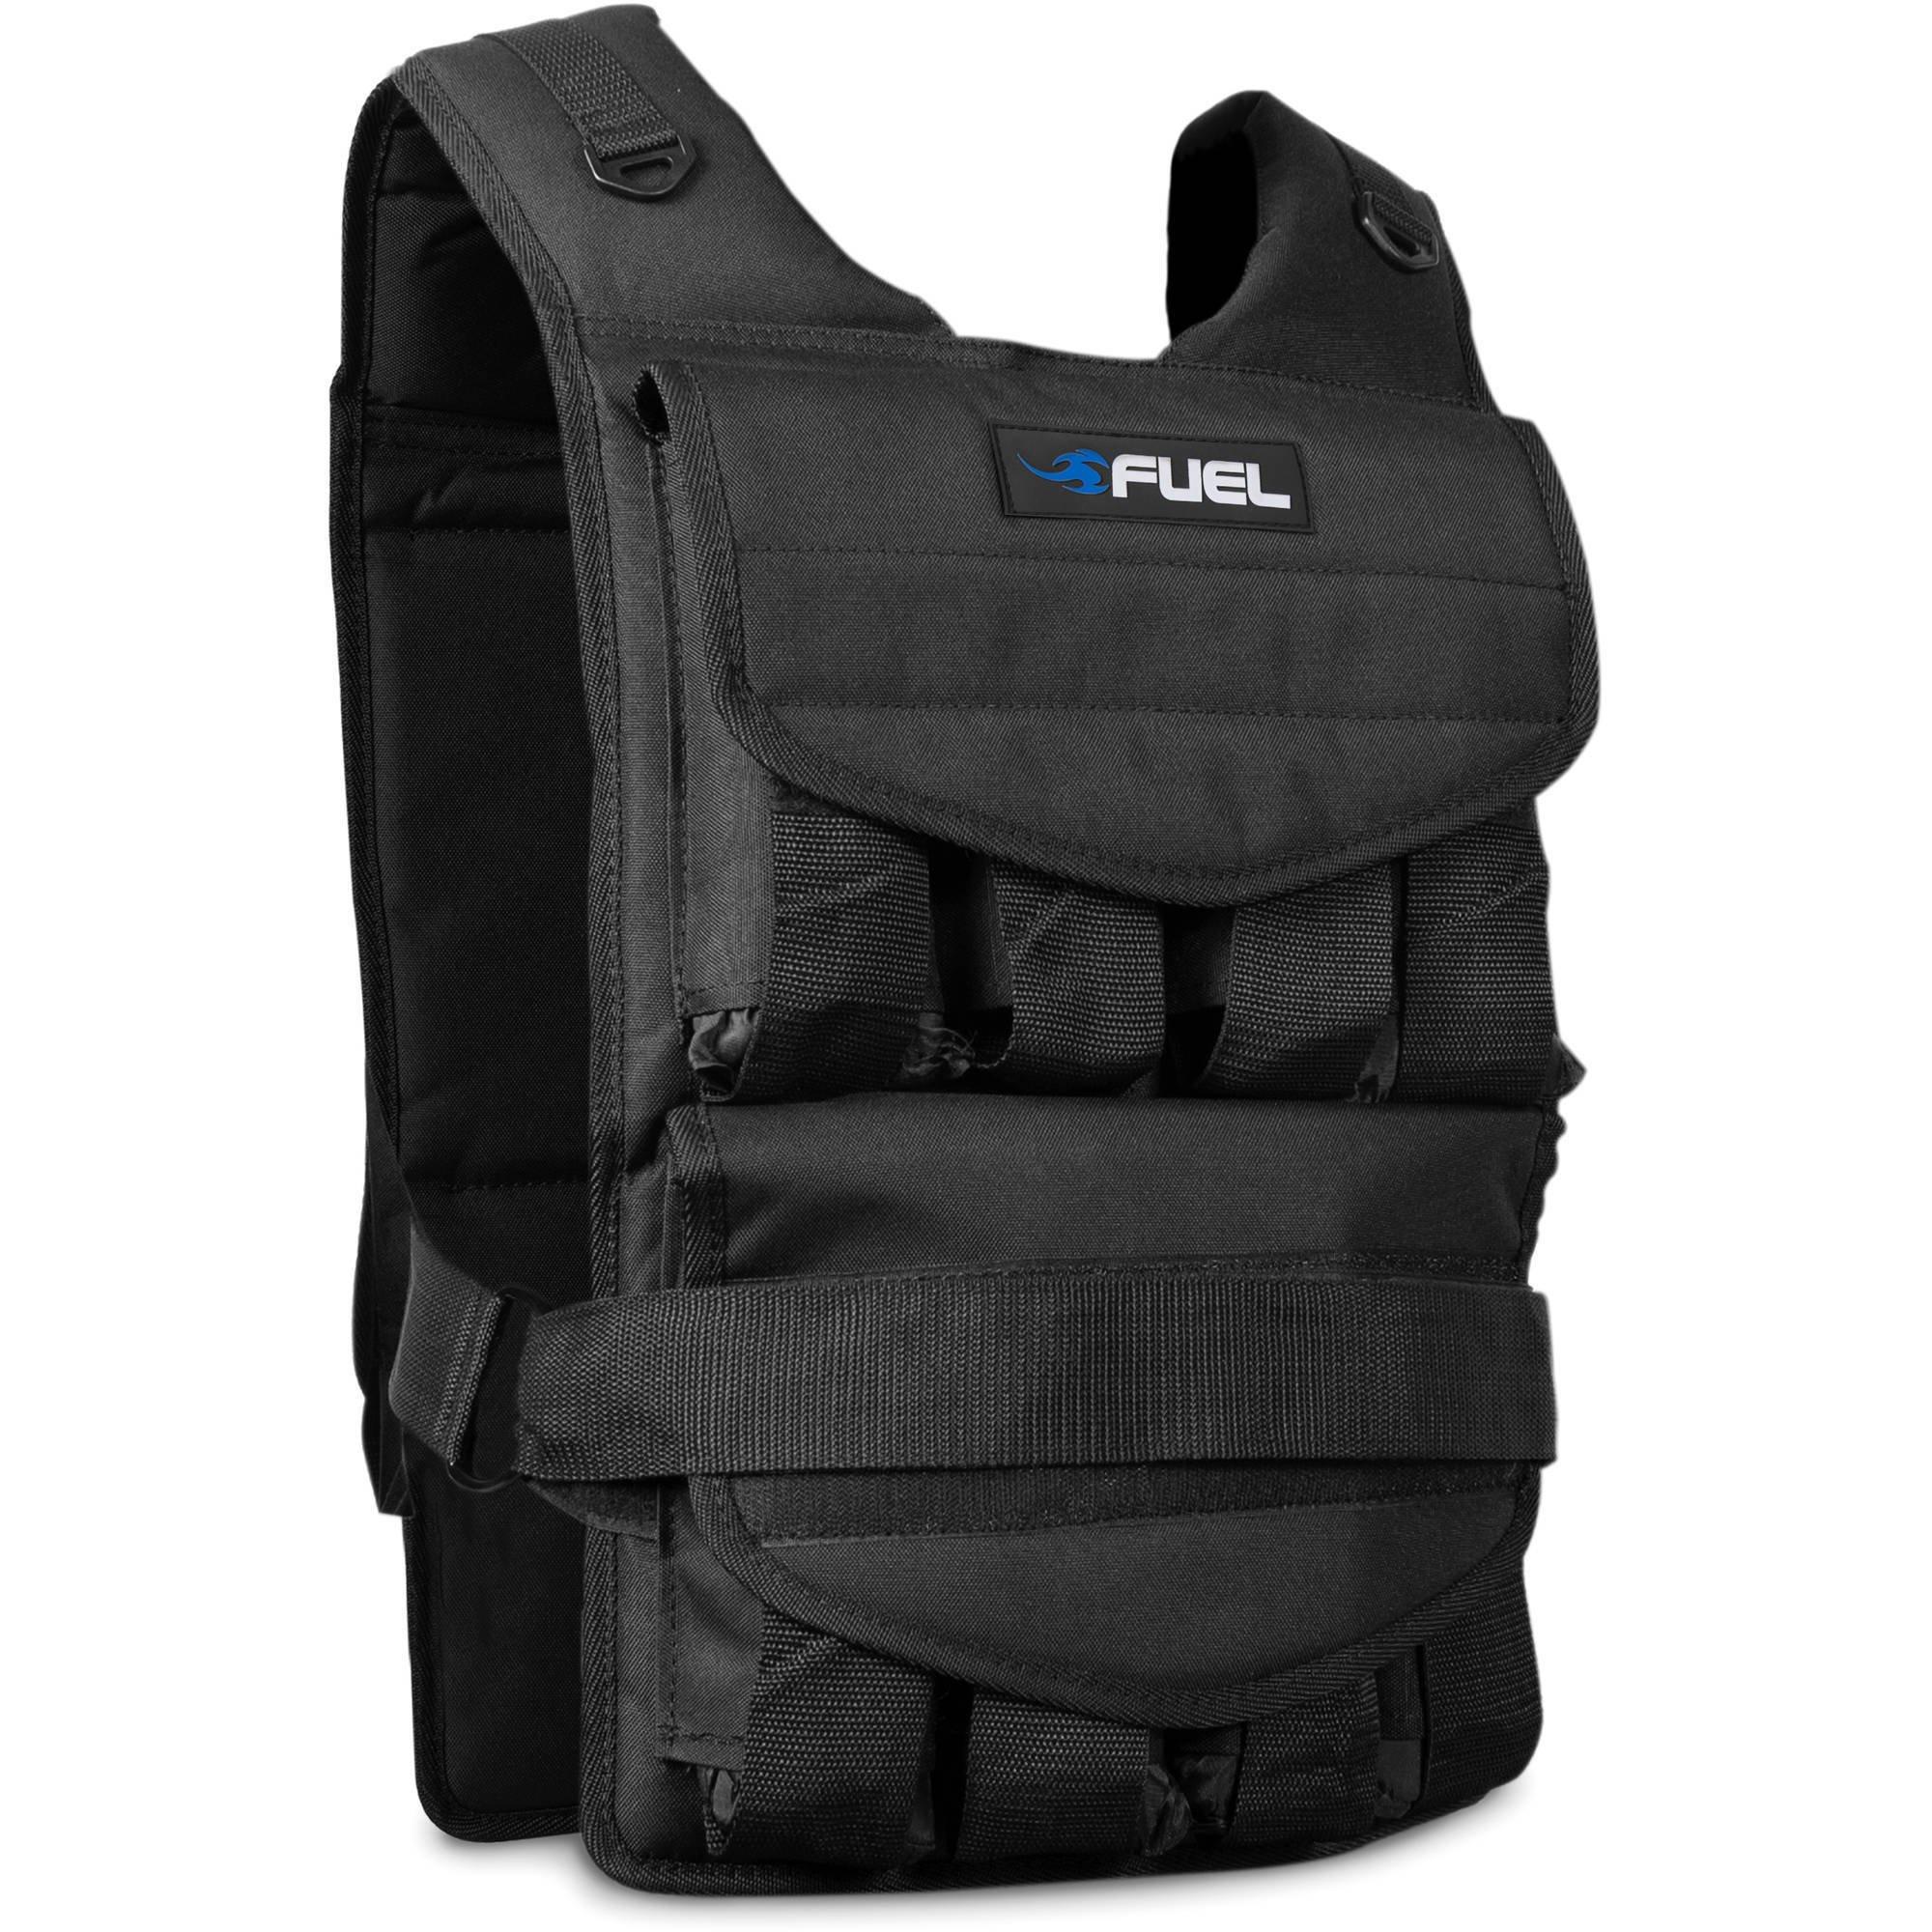 Fuel Pureformance Adjustable Weighted Vest 70 lbs Black HHWV-FL070